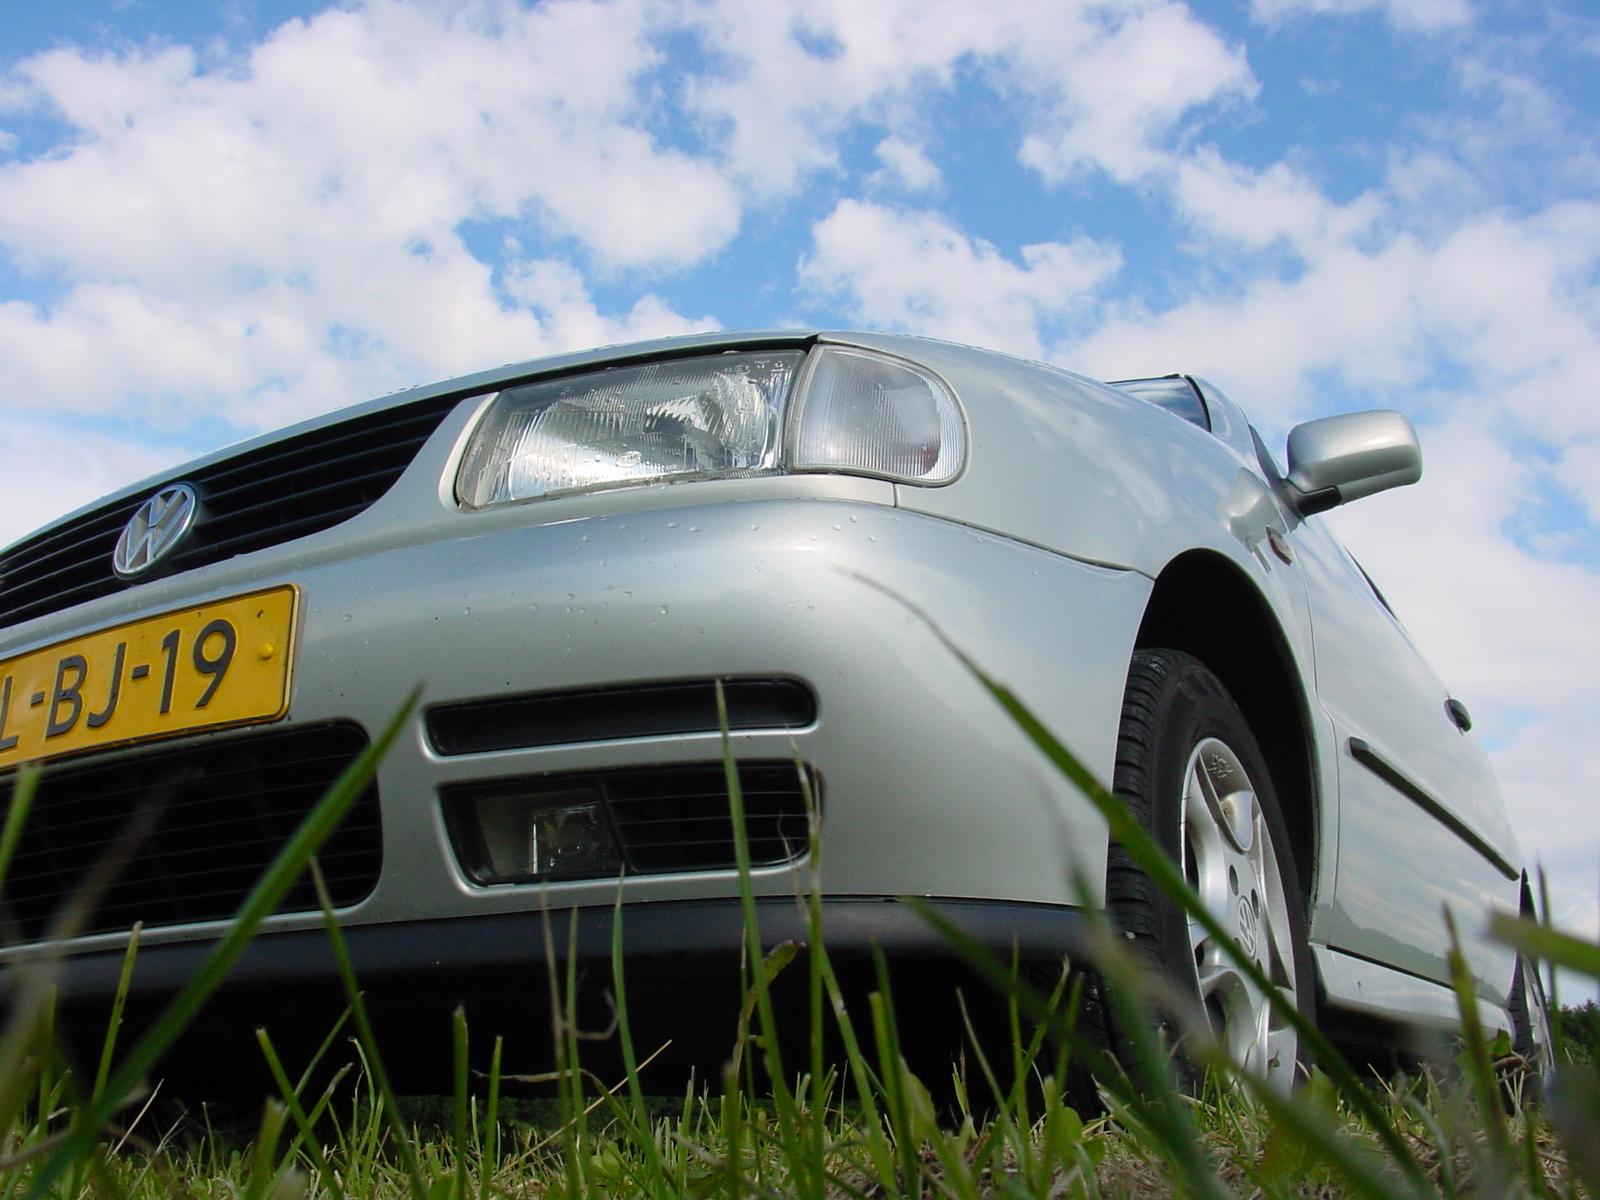 low-car-view-1551743